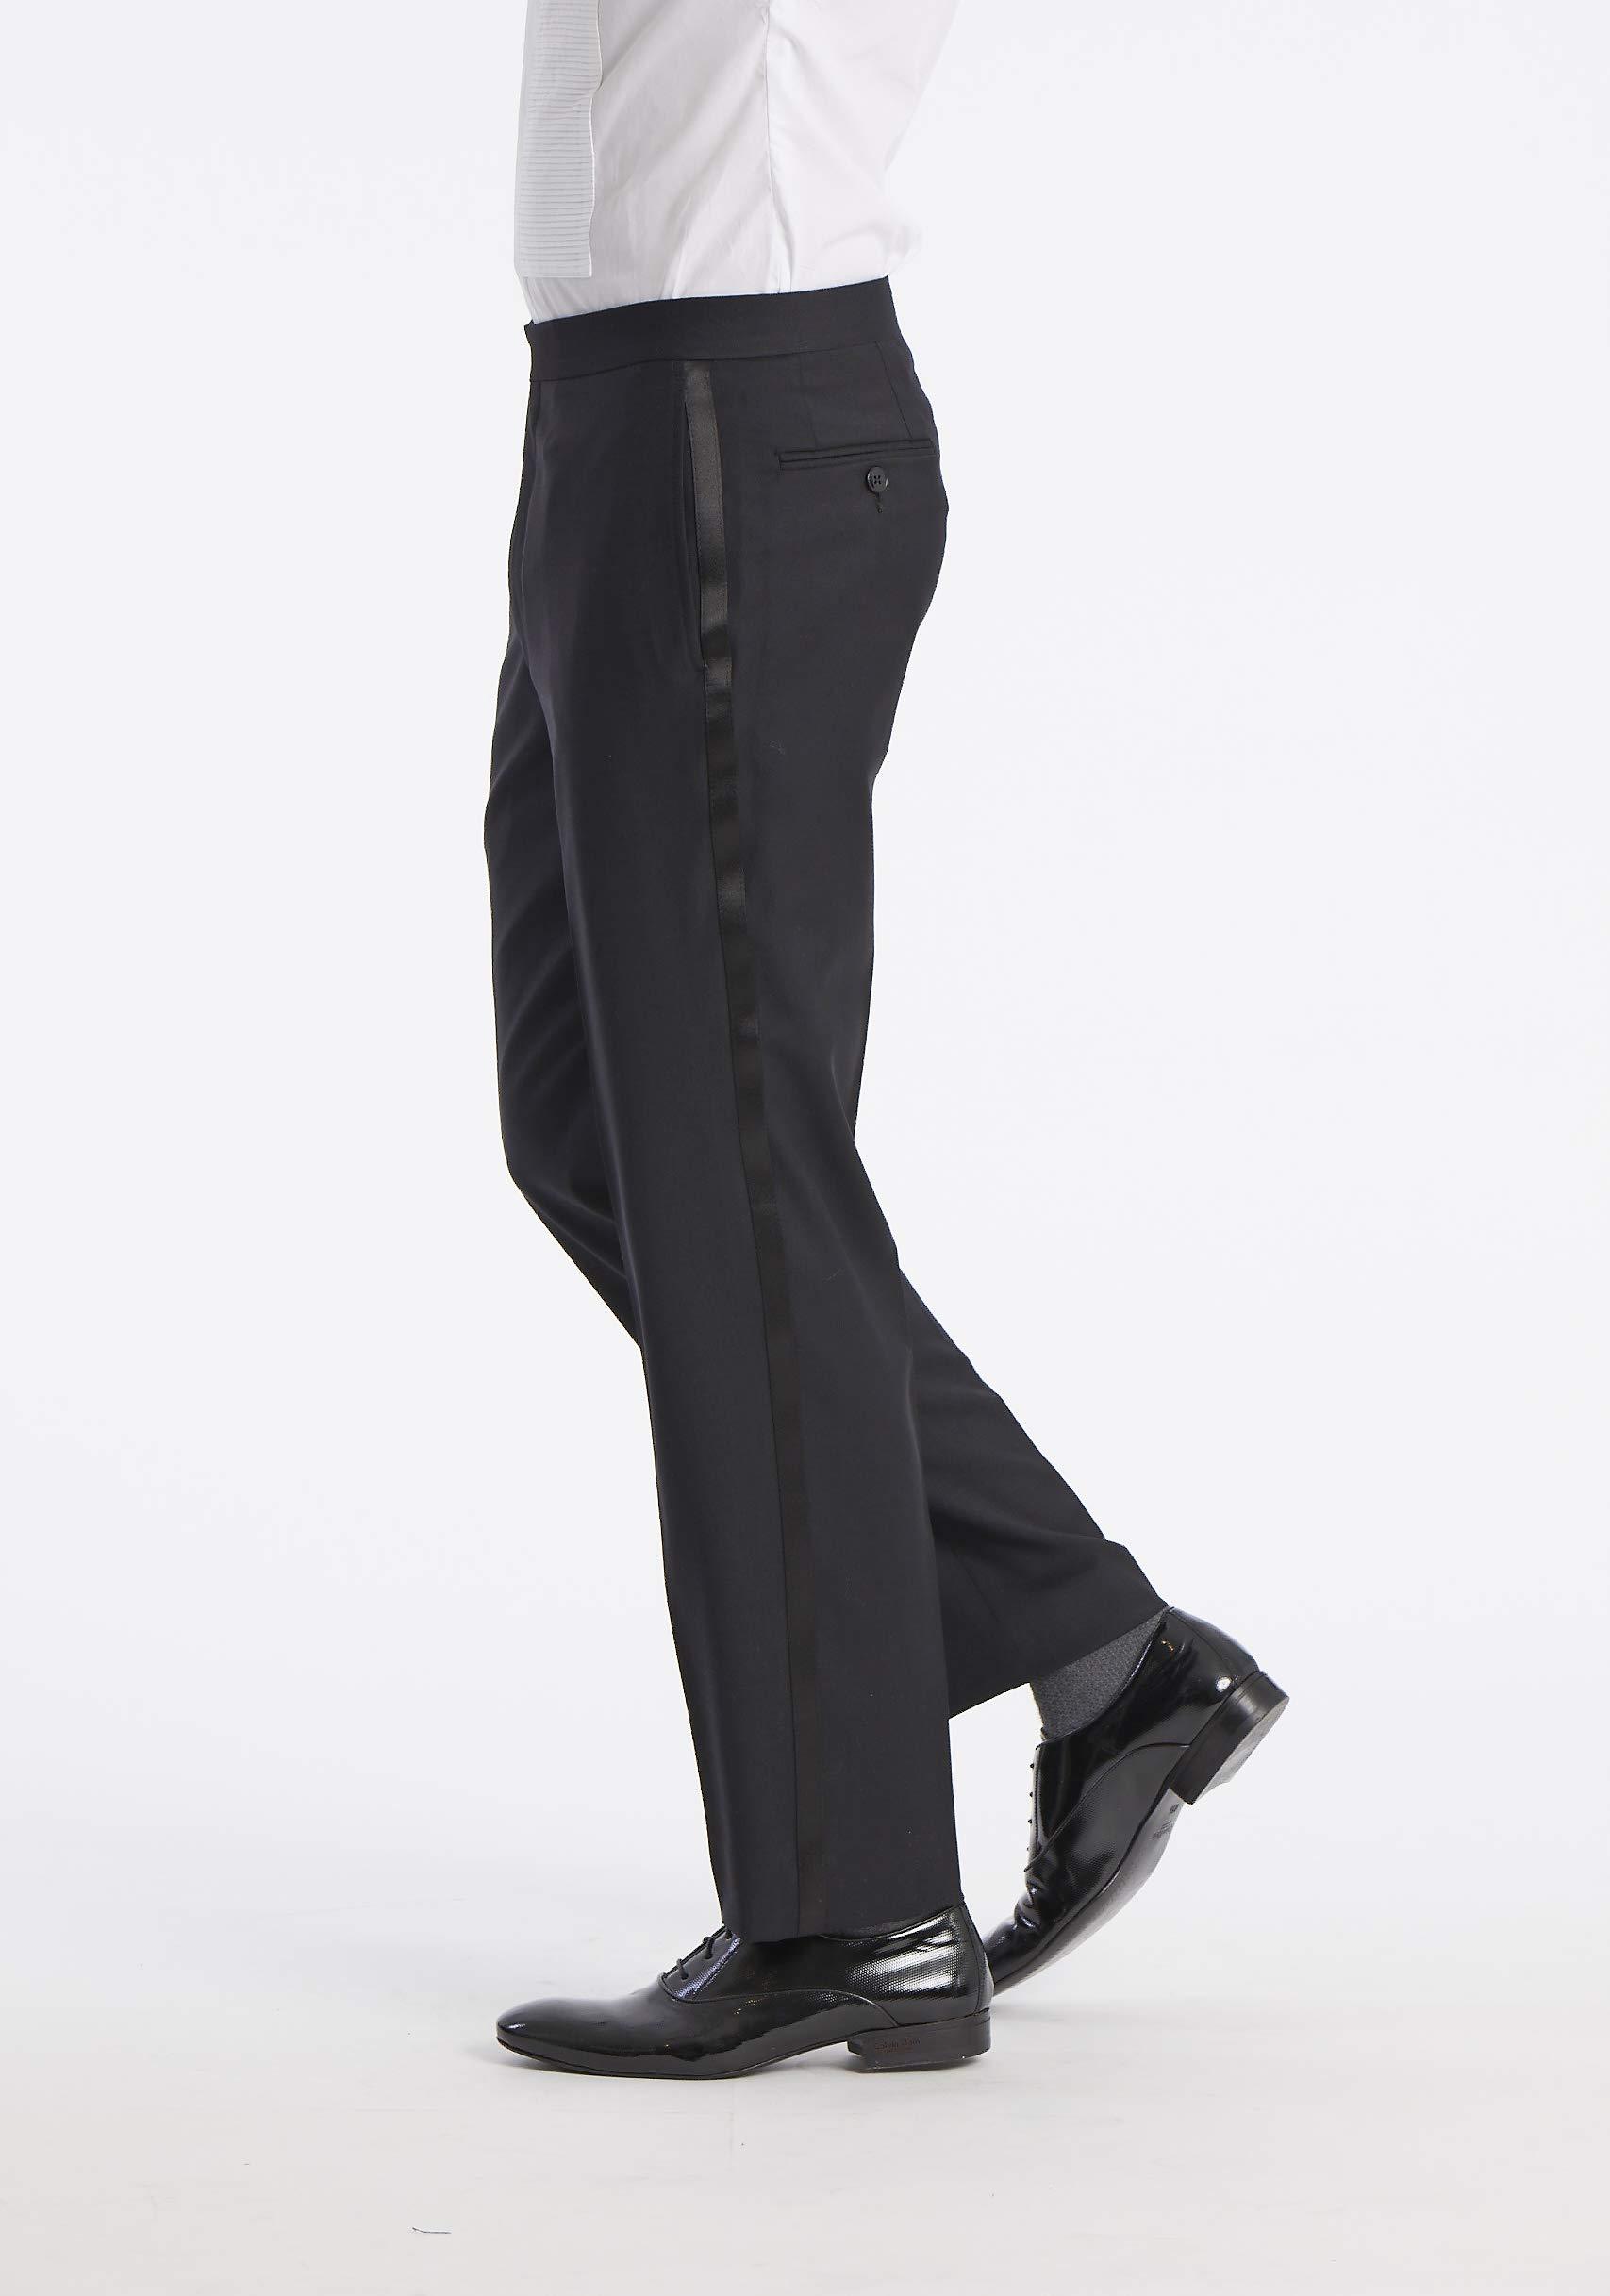 49cd00873513 Calvin Klein Men's Modern Fit 100% Wool Tuxedo Suit Separate (Blazer and  Pant), Black, 34W x 30L - JSENPTSP0000 < Tuxedos < Clothing, Shoes &  Jewelry - tibs